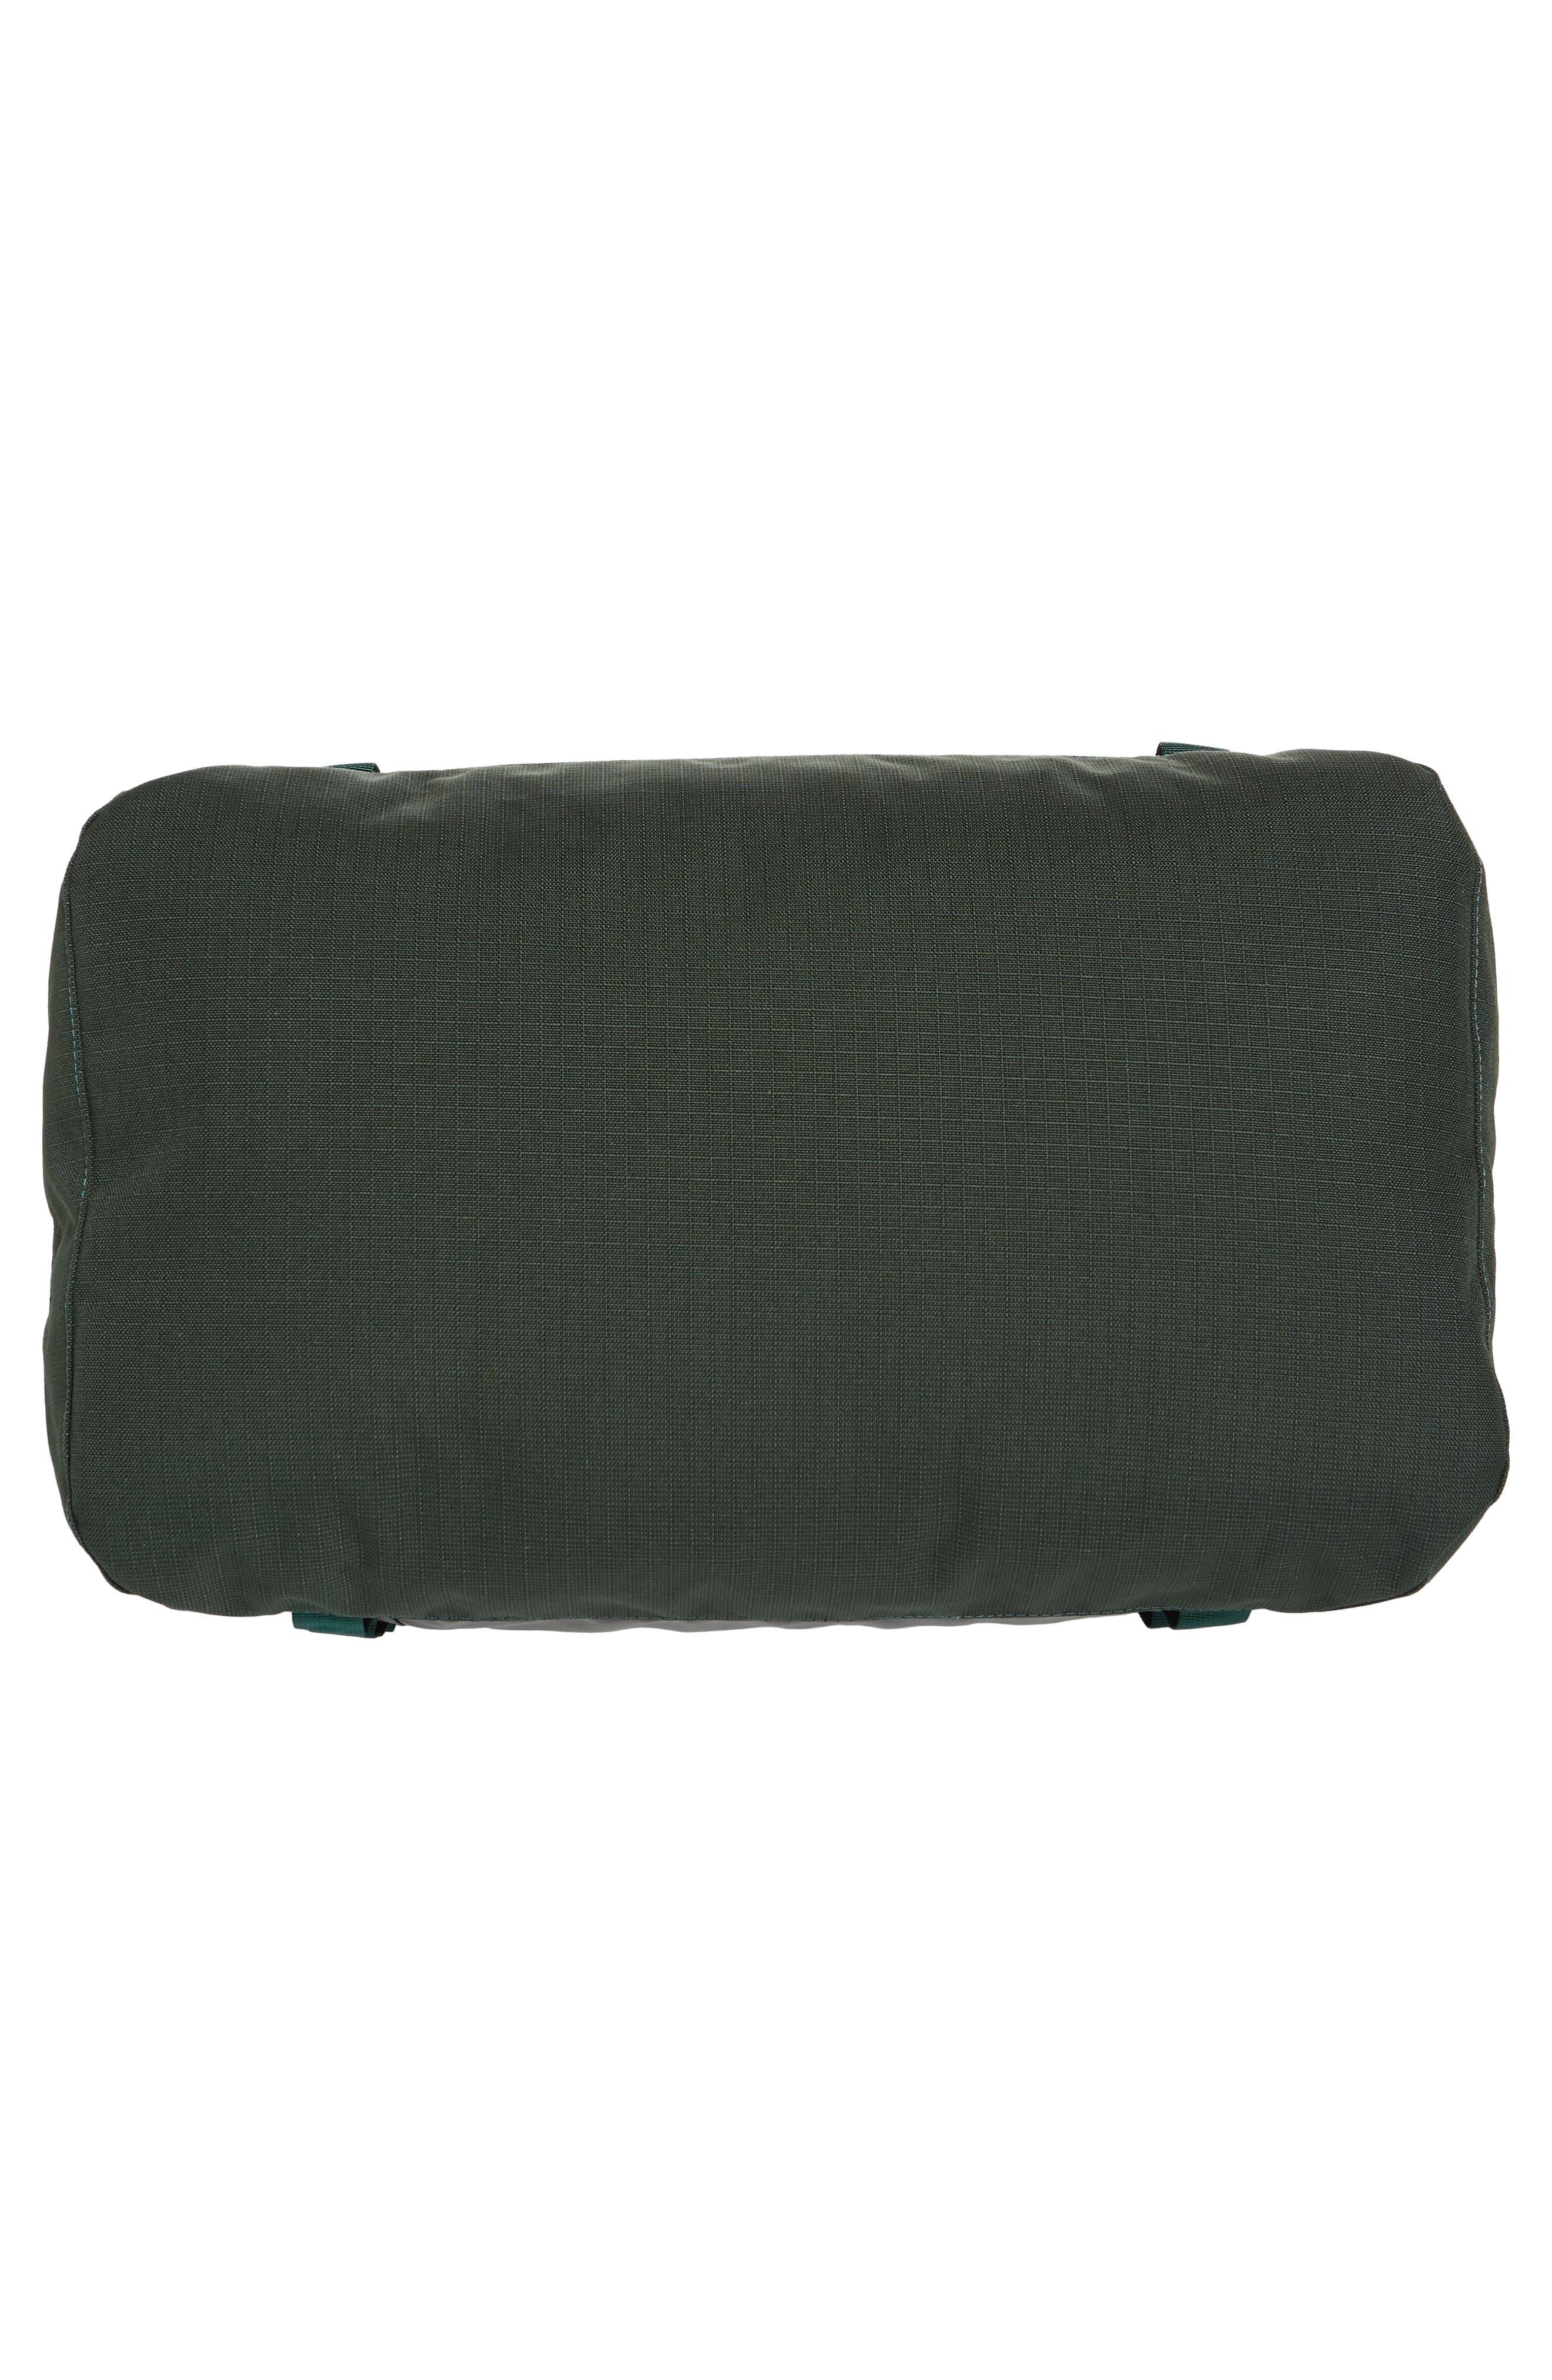 ,                             Black Hole Water Repellent 45-Liter Duffle Bag,                             Alternate thumbnail 39, color,                             301